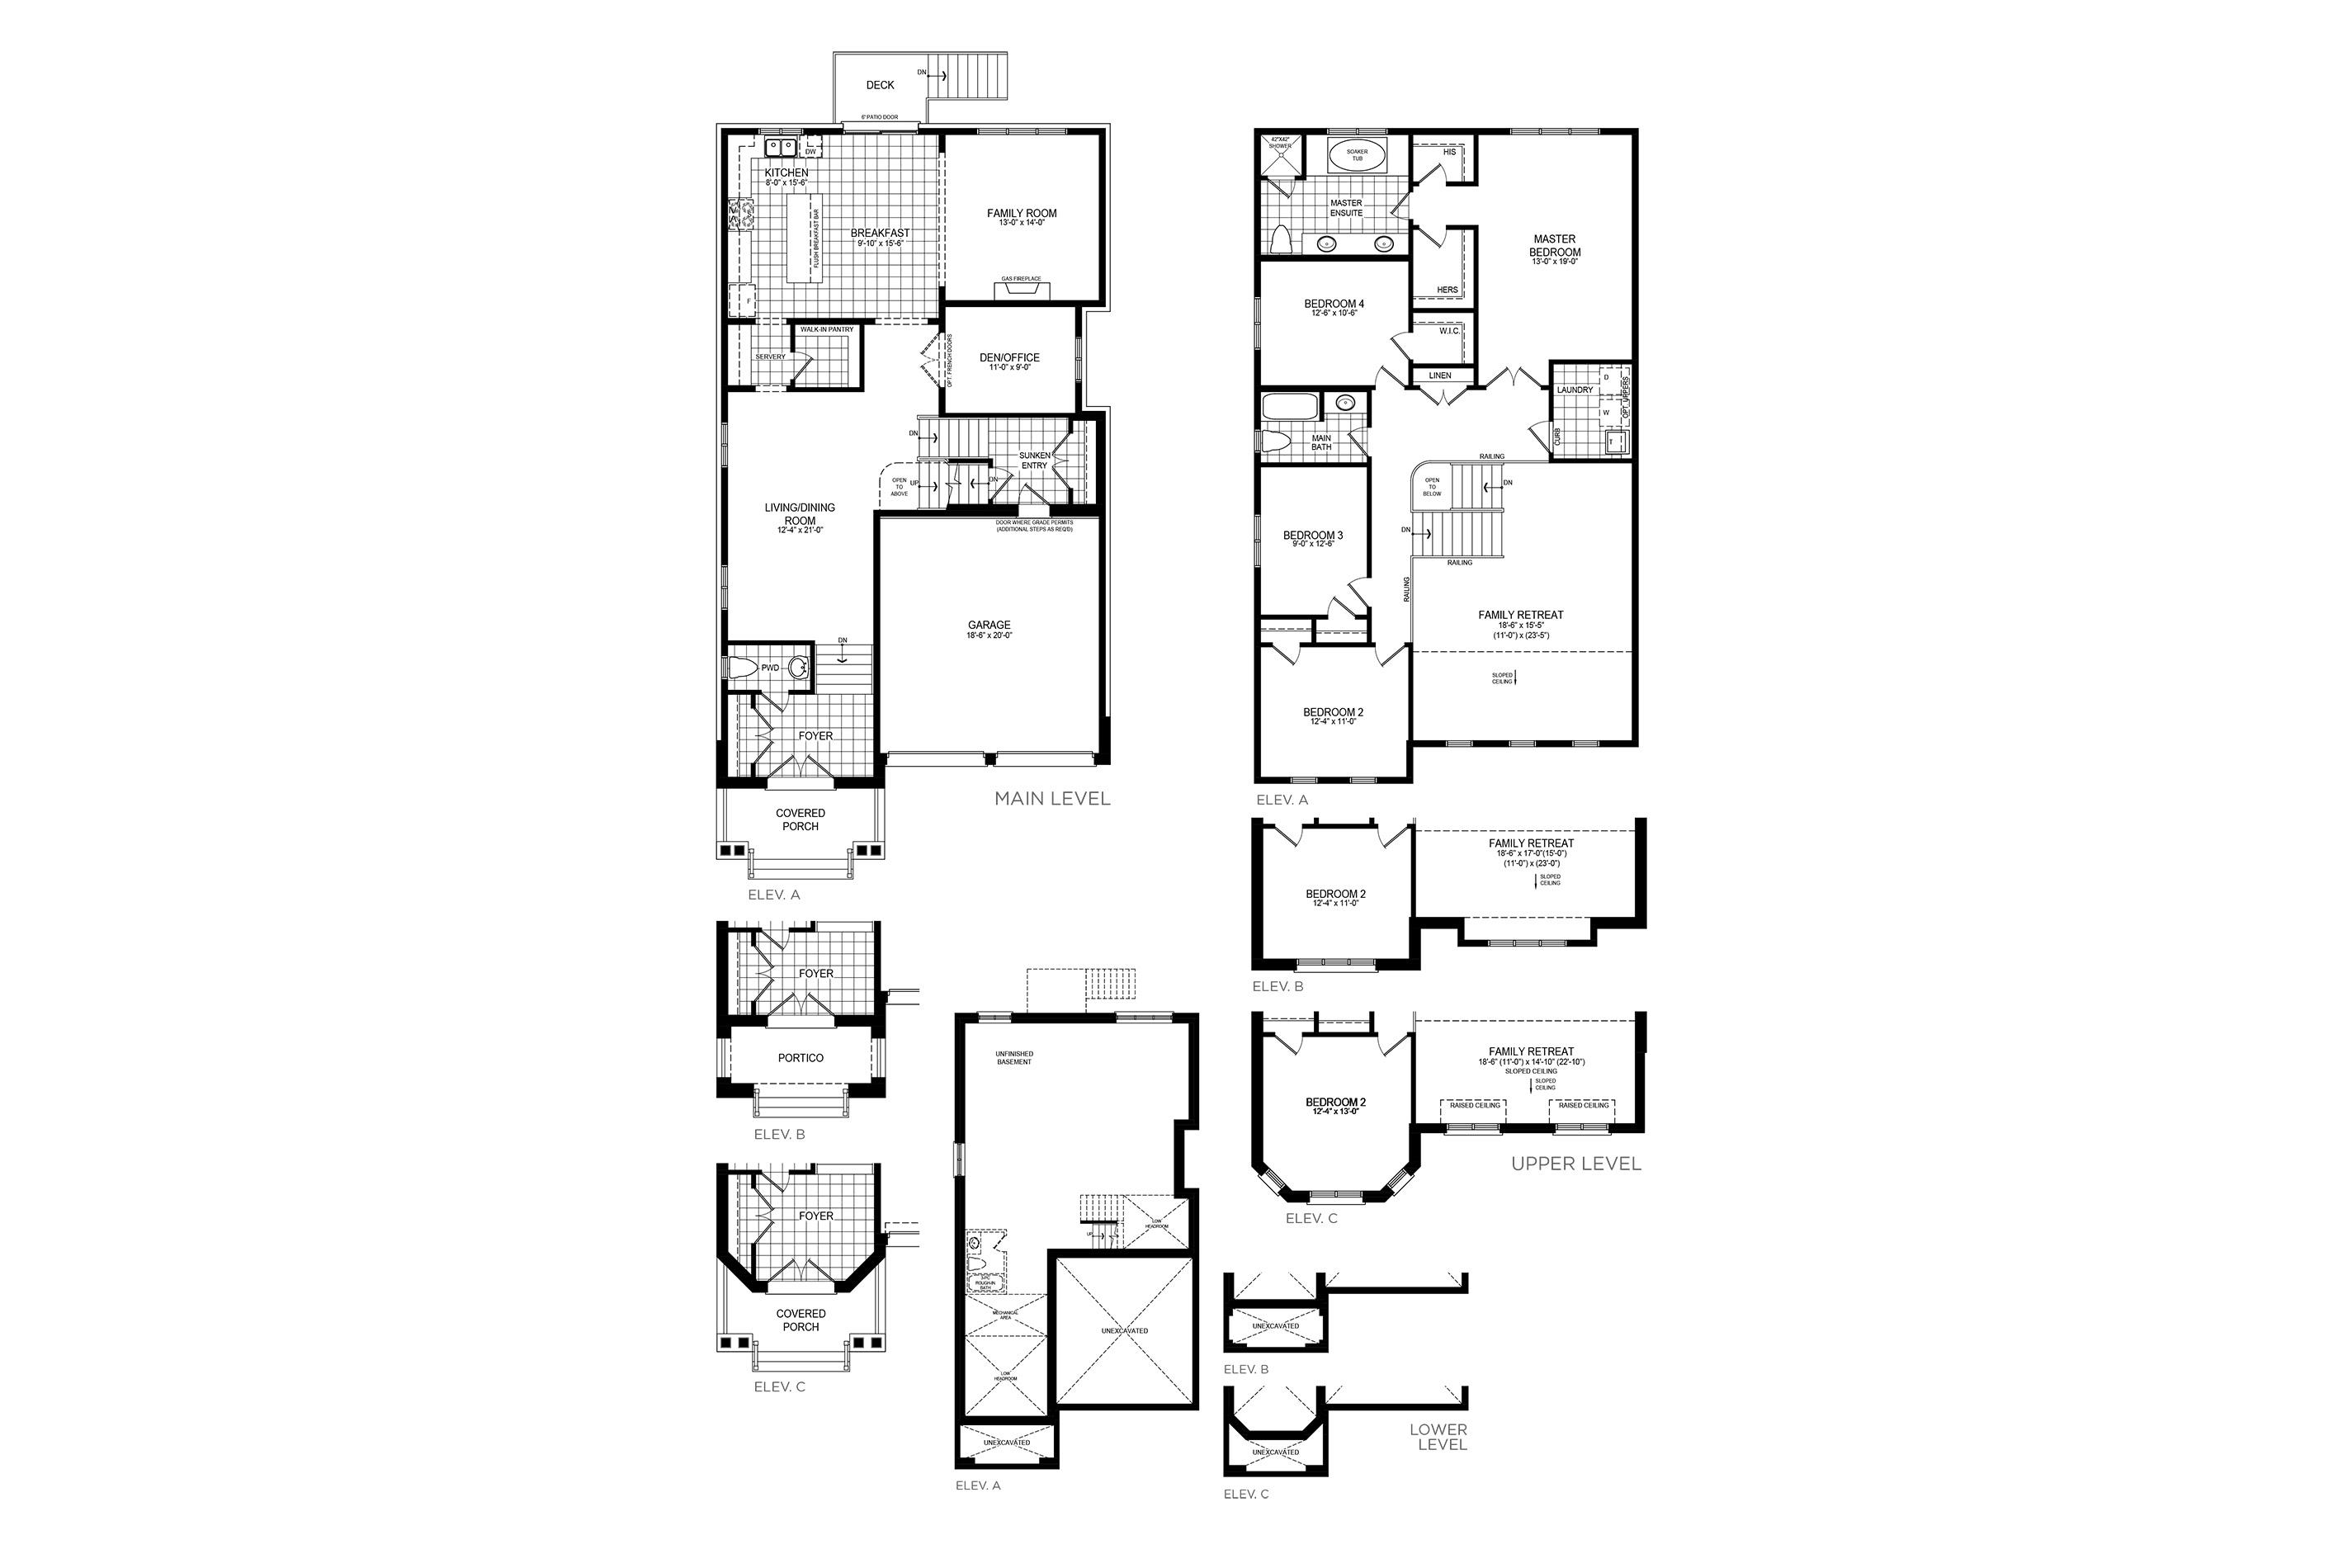 Kingsbury 11 Floorplan